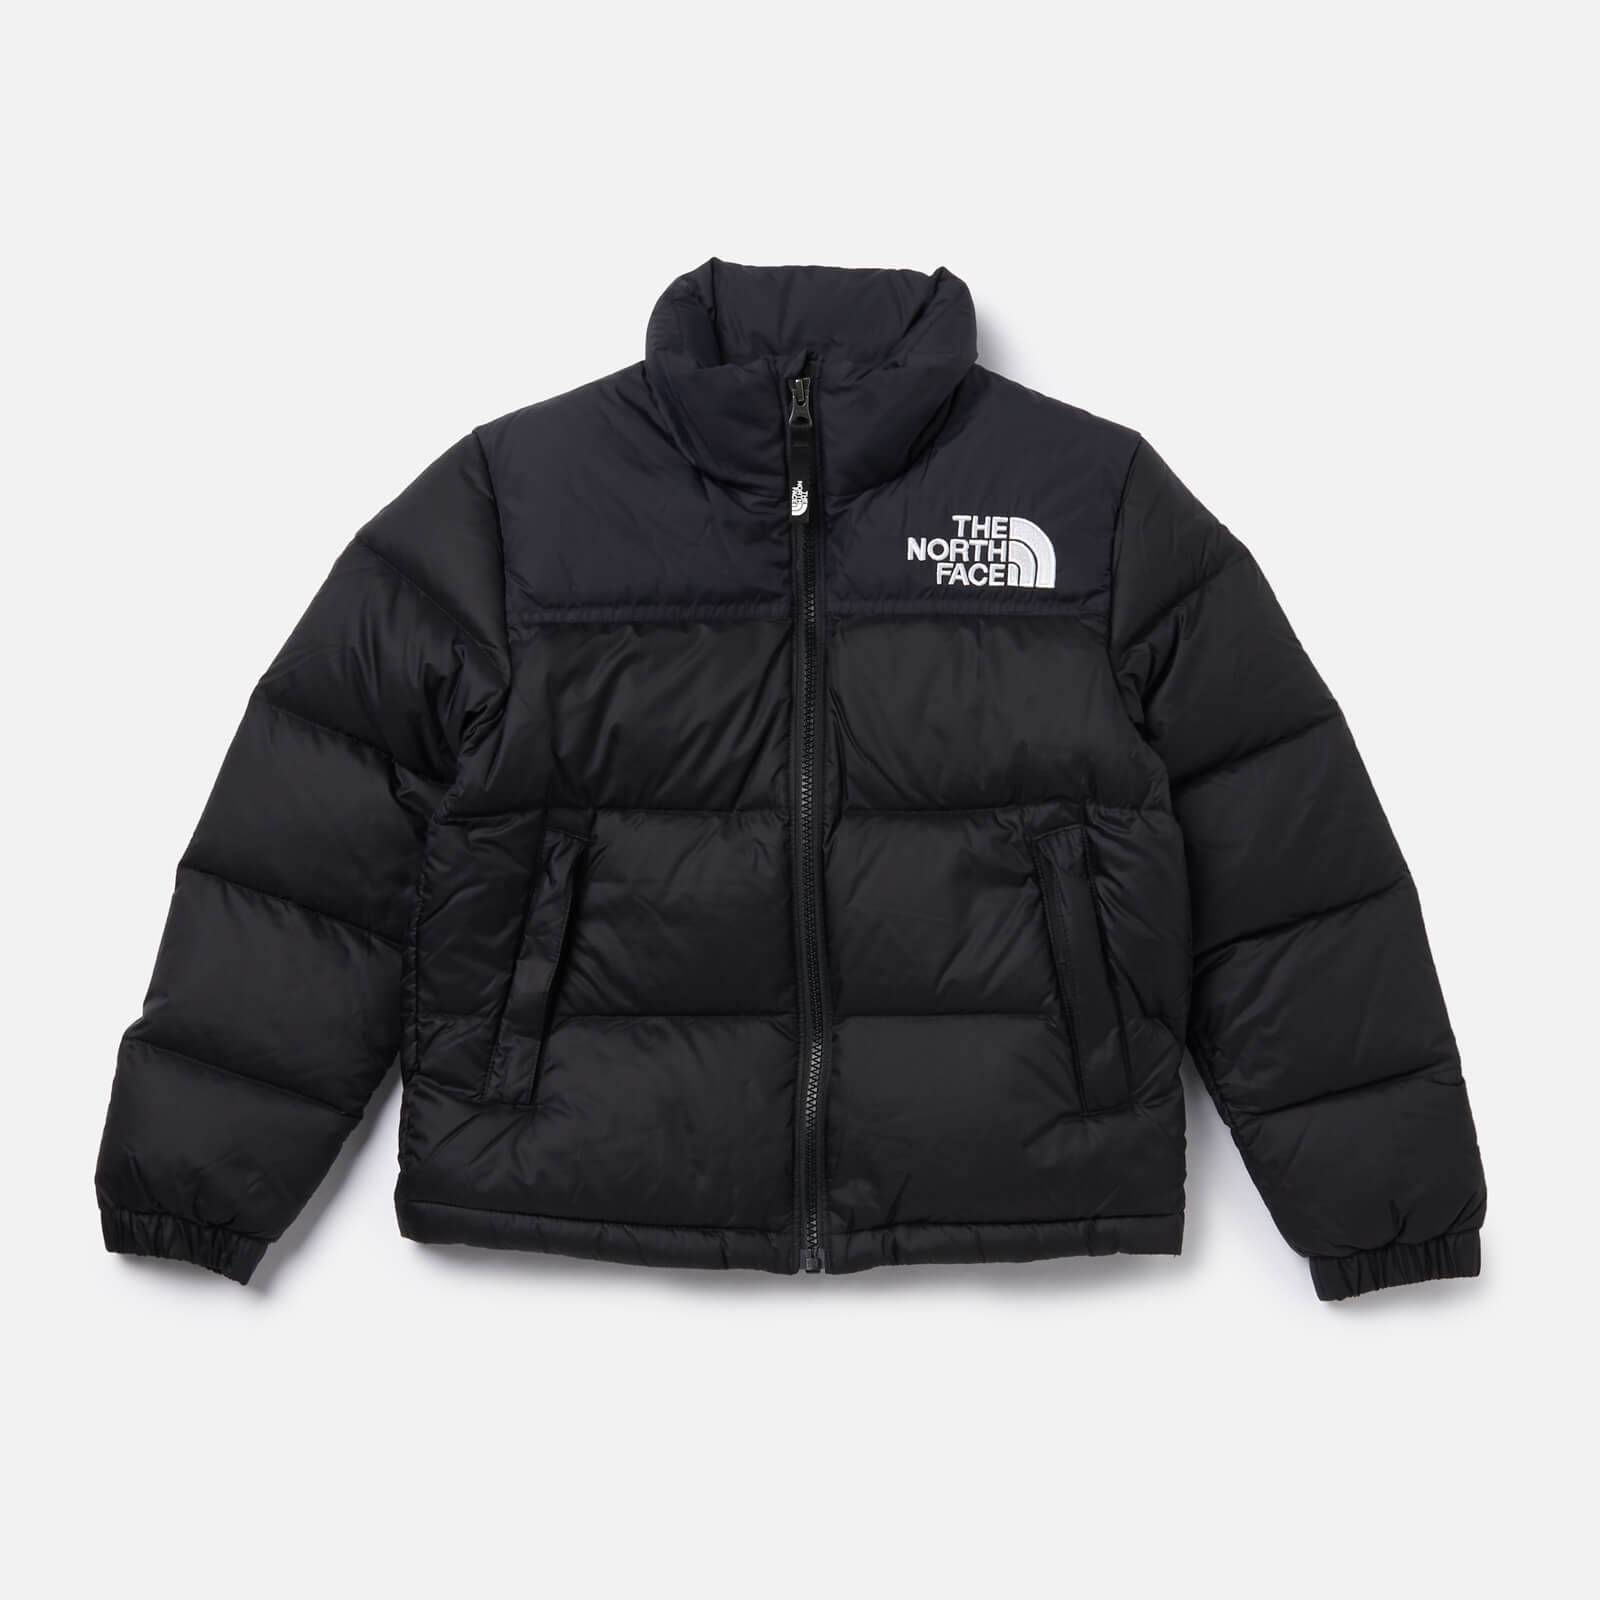 The North Face Boys' 1996 Retro Nuptse Down Jacket - TNF Black - XS